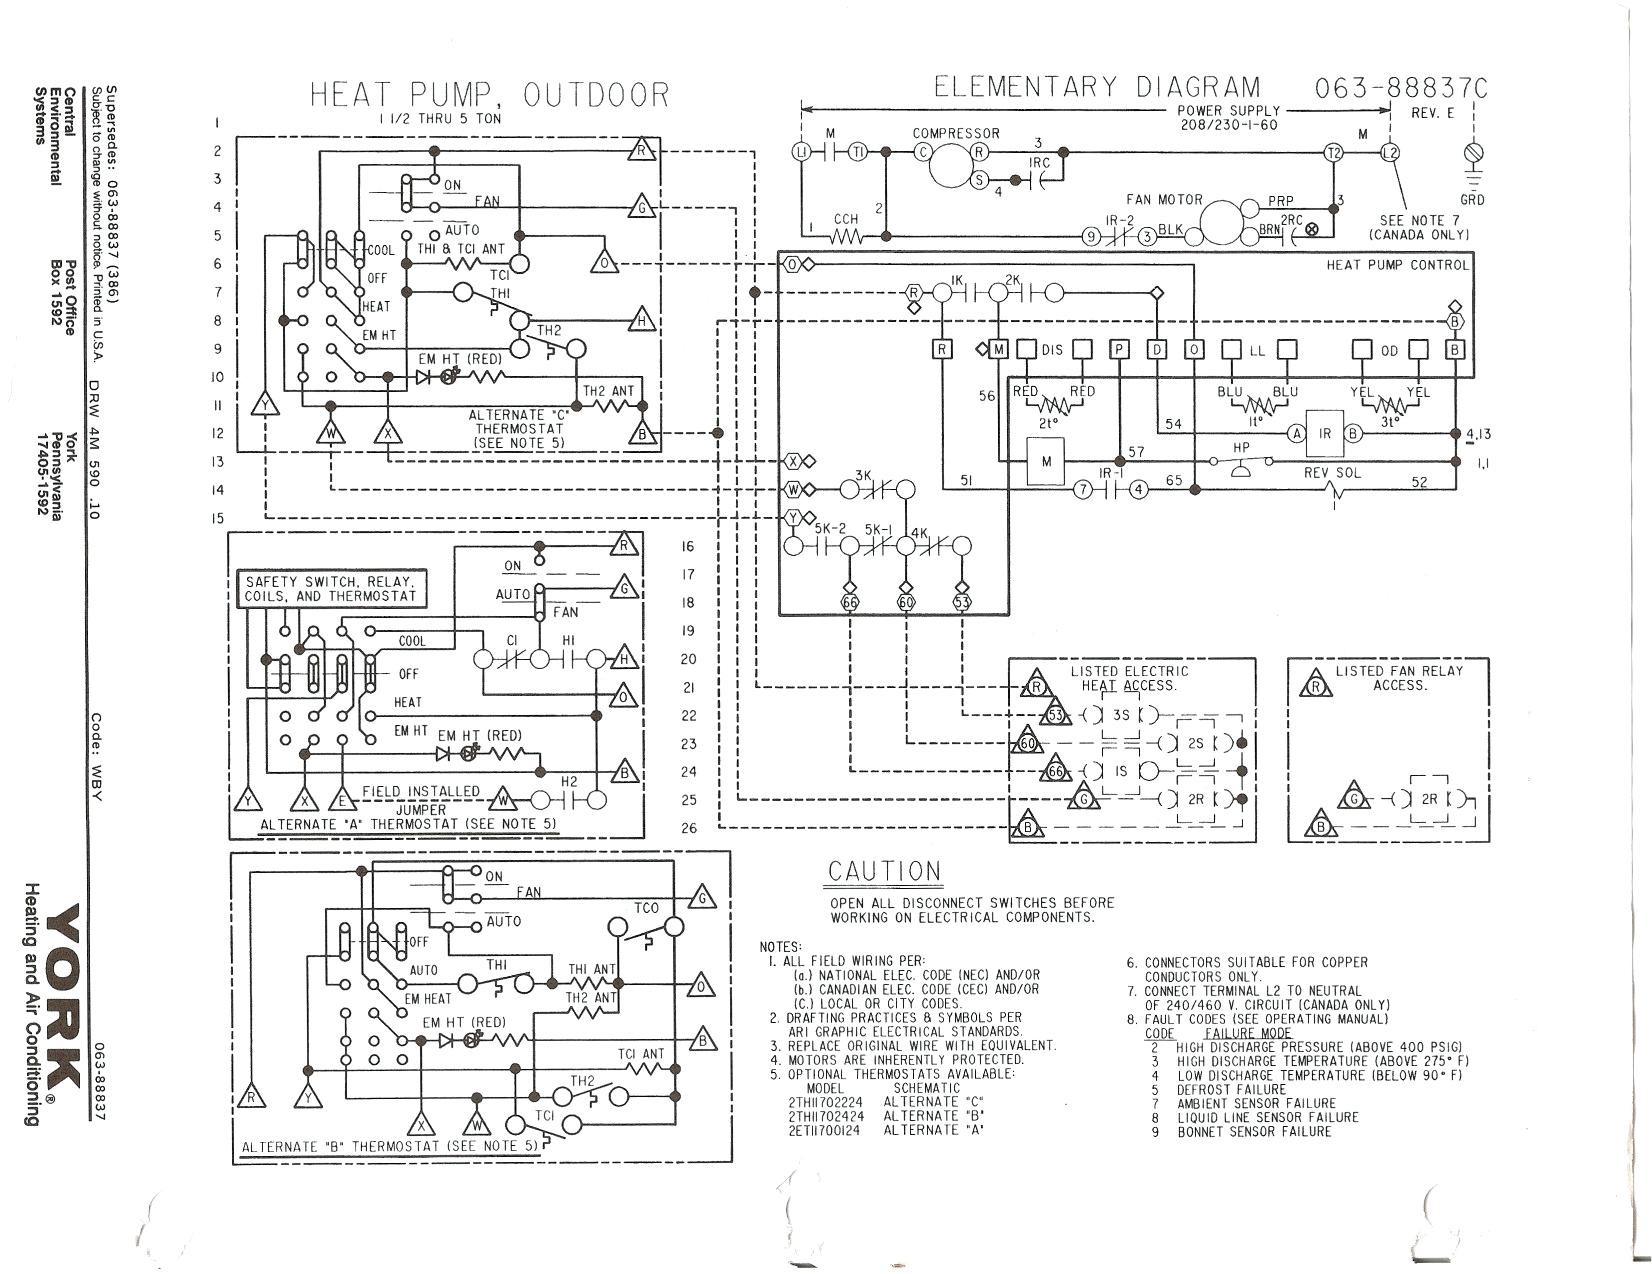 Ac Low Voltage Wiring Diagram   My Wiring DIagram Ac Low Voltage Wiring Diagram on